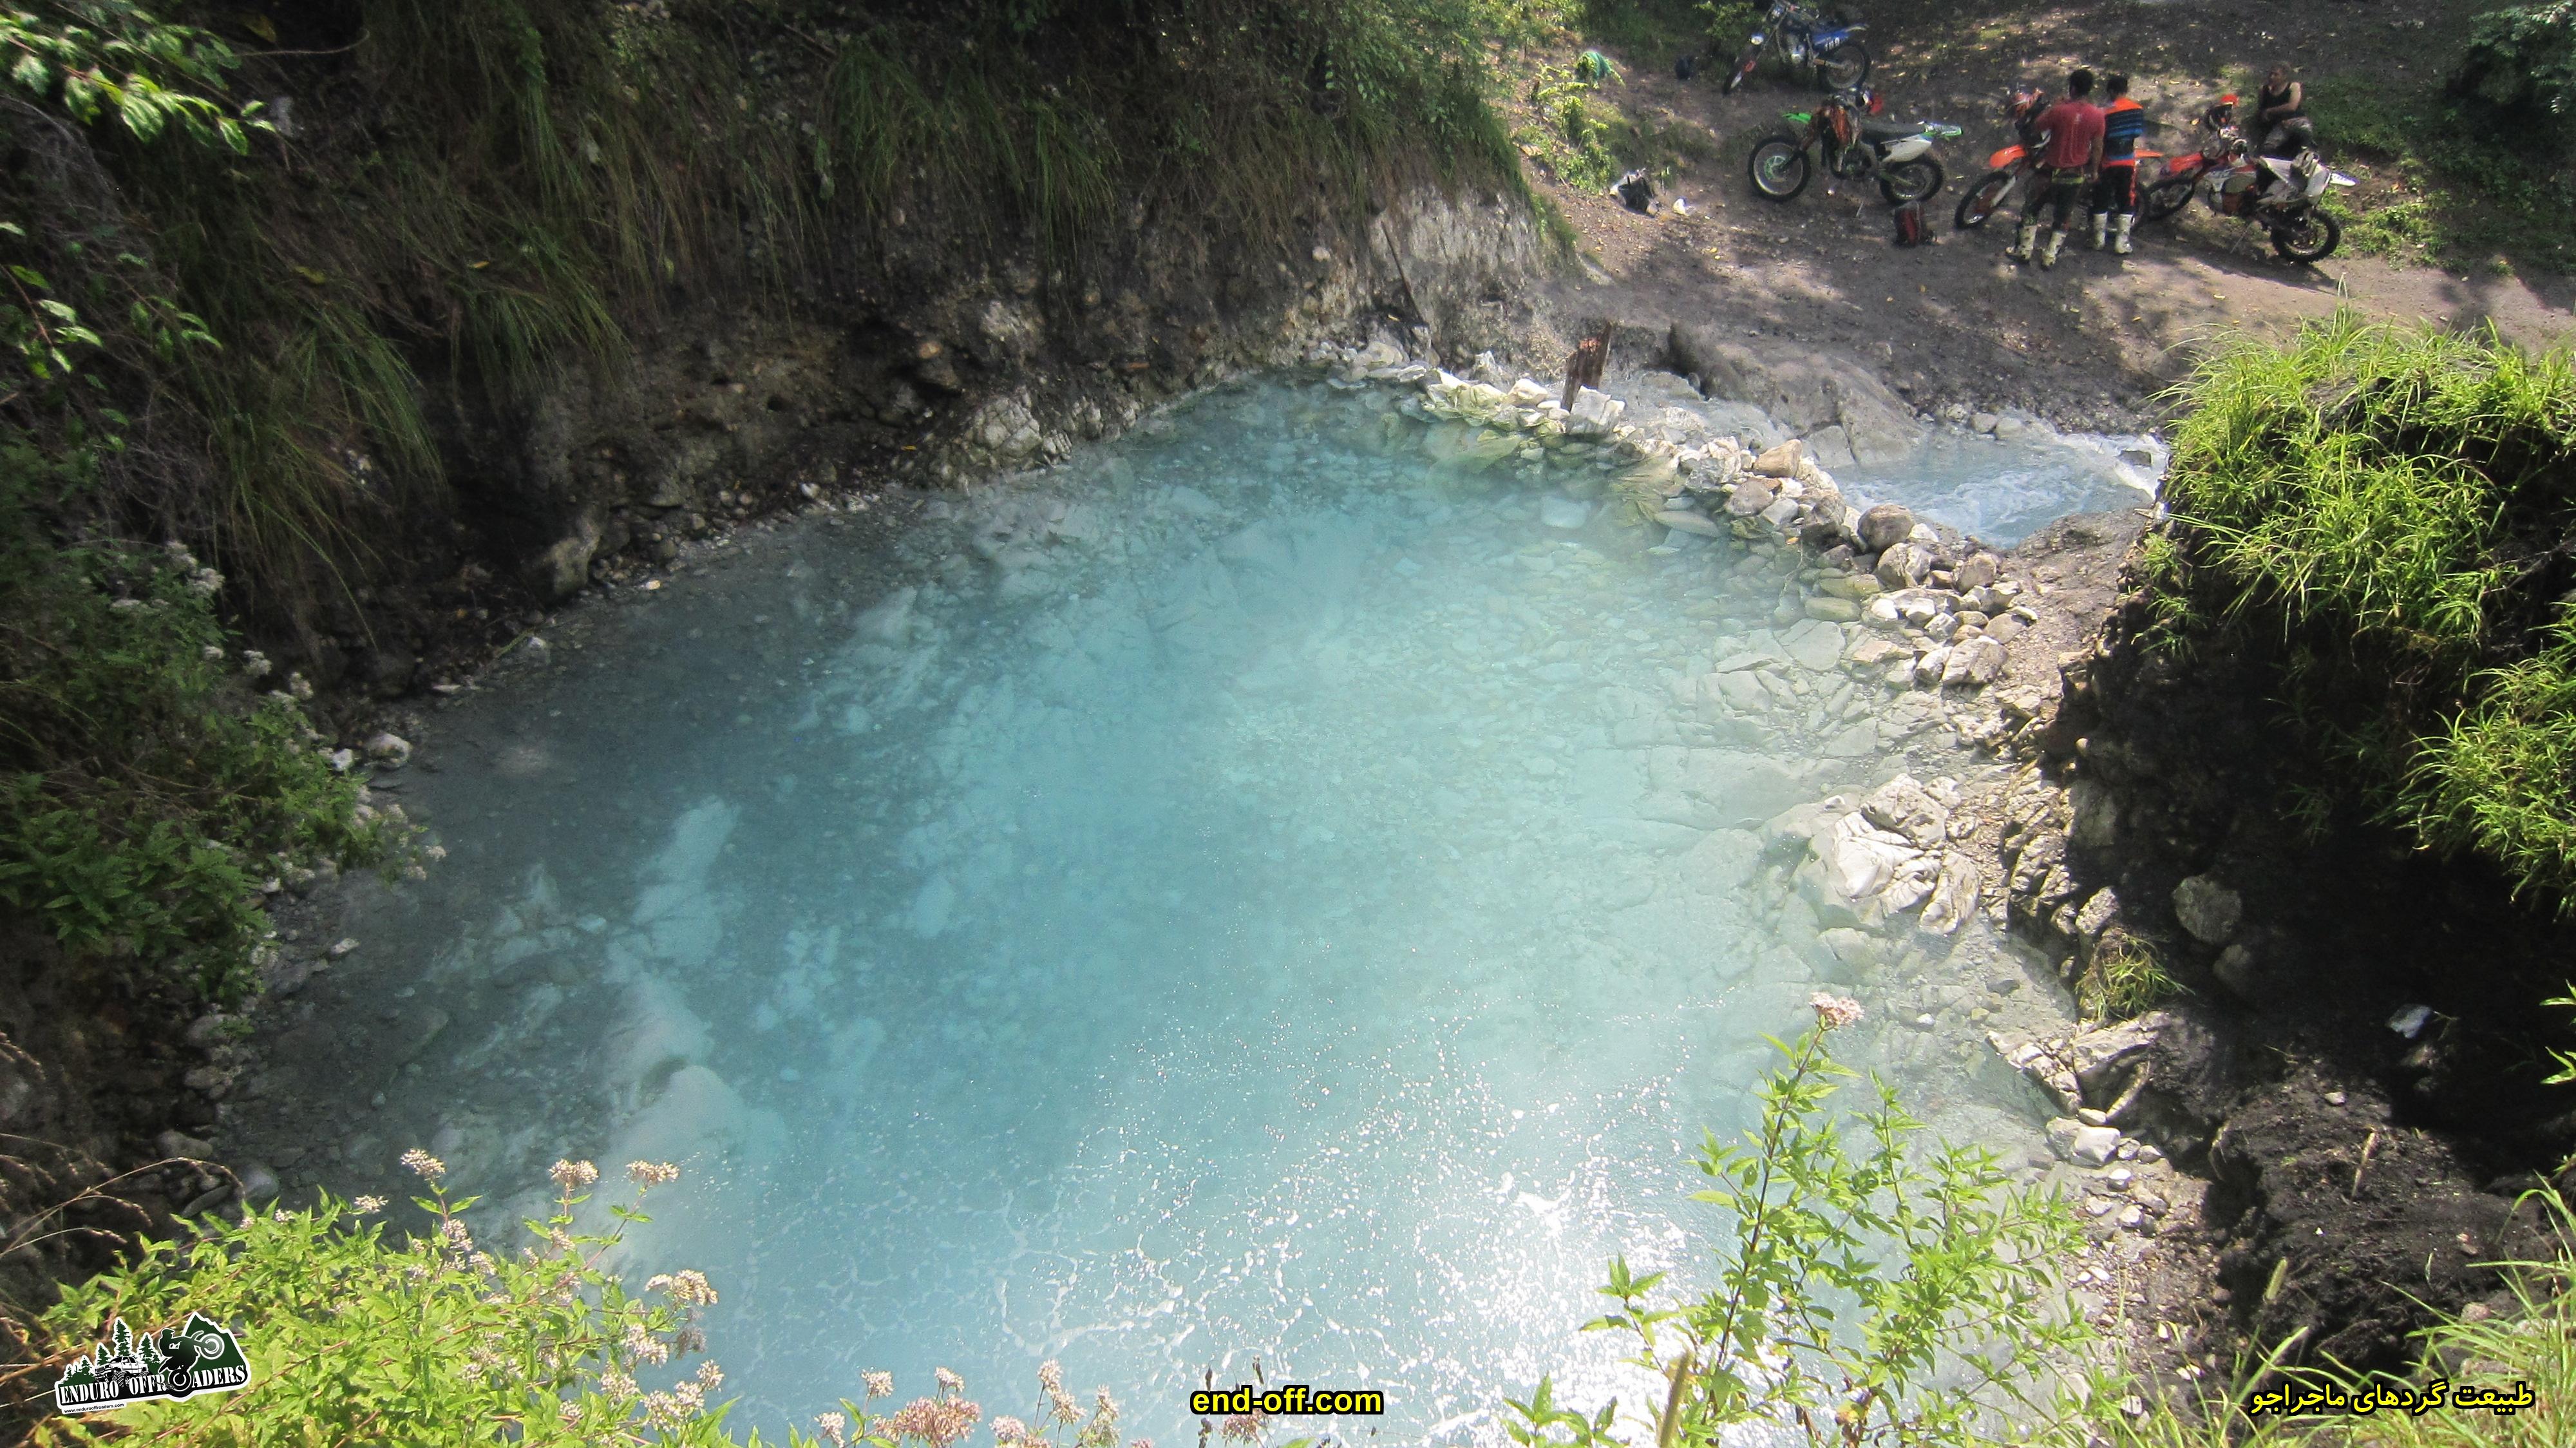 آب گوگردی بلیران - تابستان 1399 - 2020